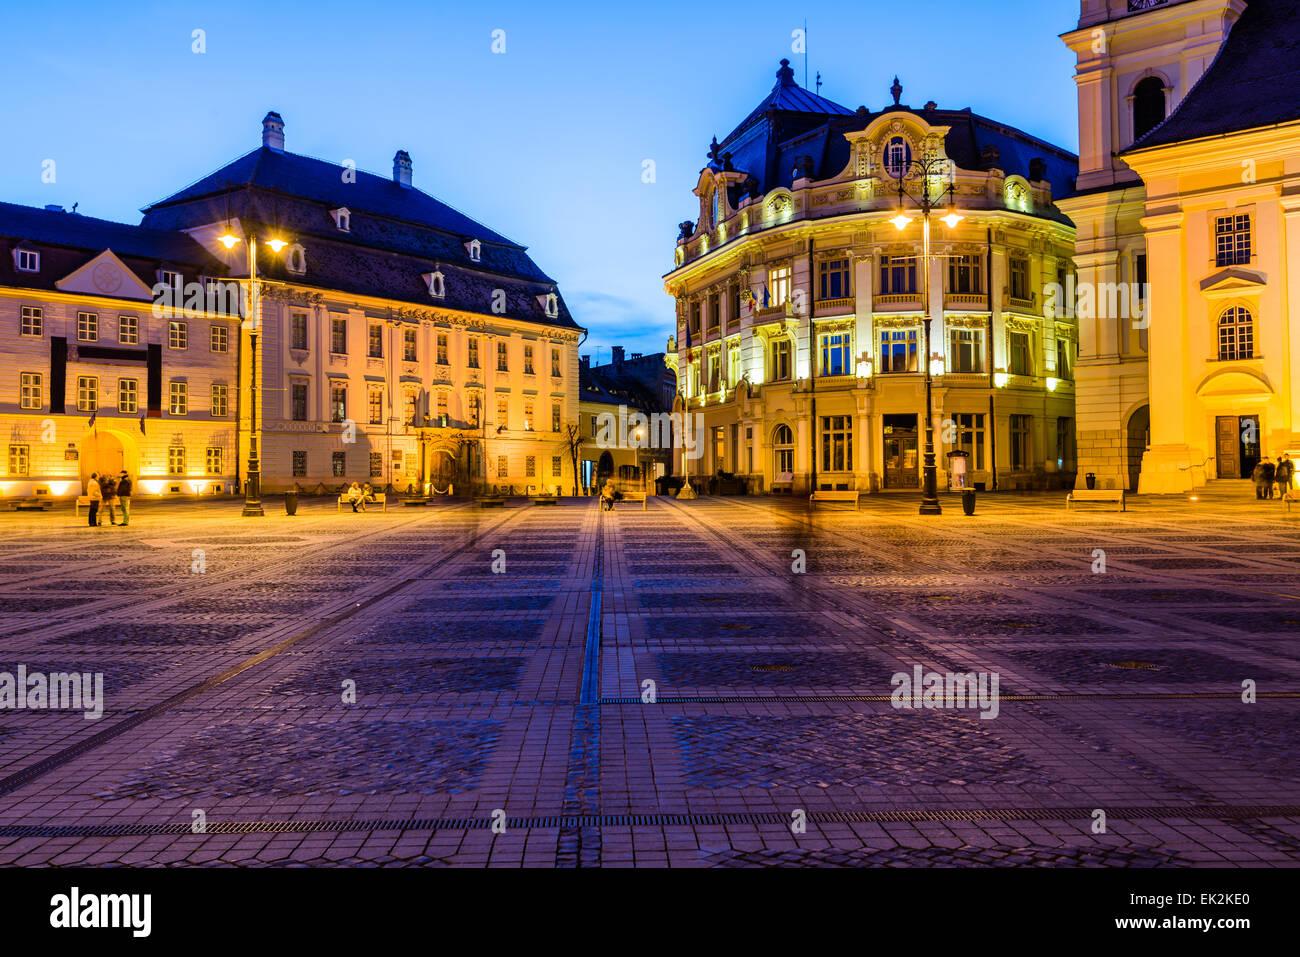 City hall and Brukenthal palace in Sibiu, Transylvania, Romania, at night Stock Photo